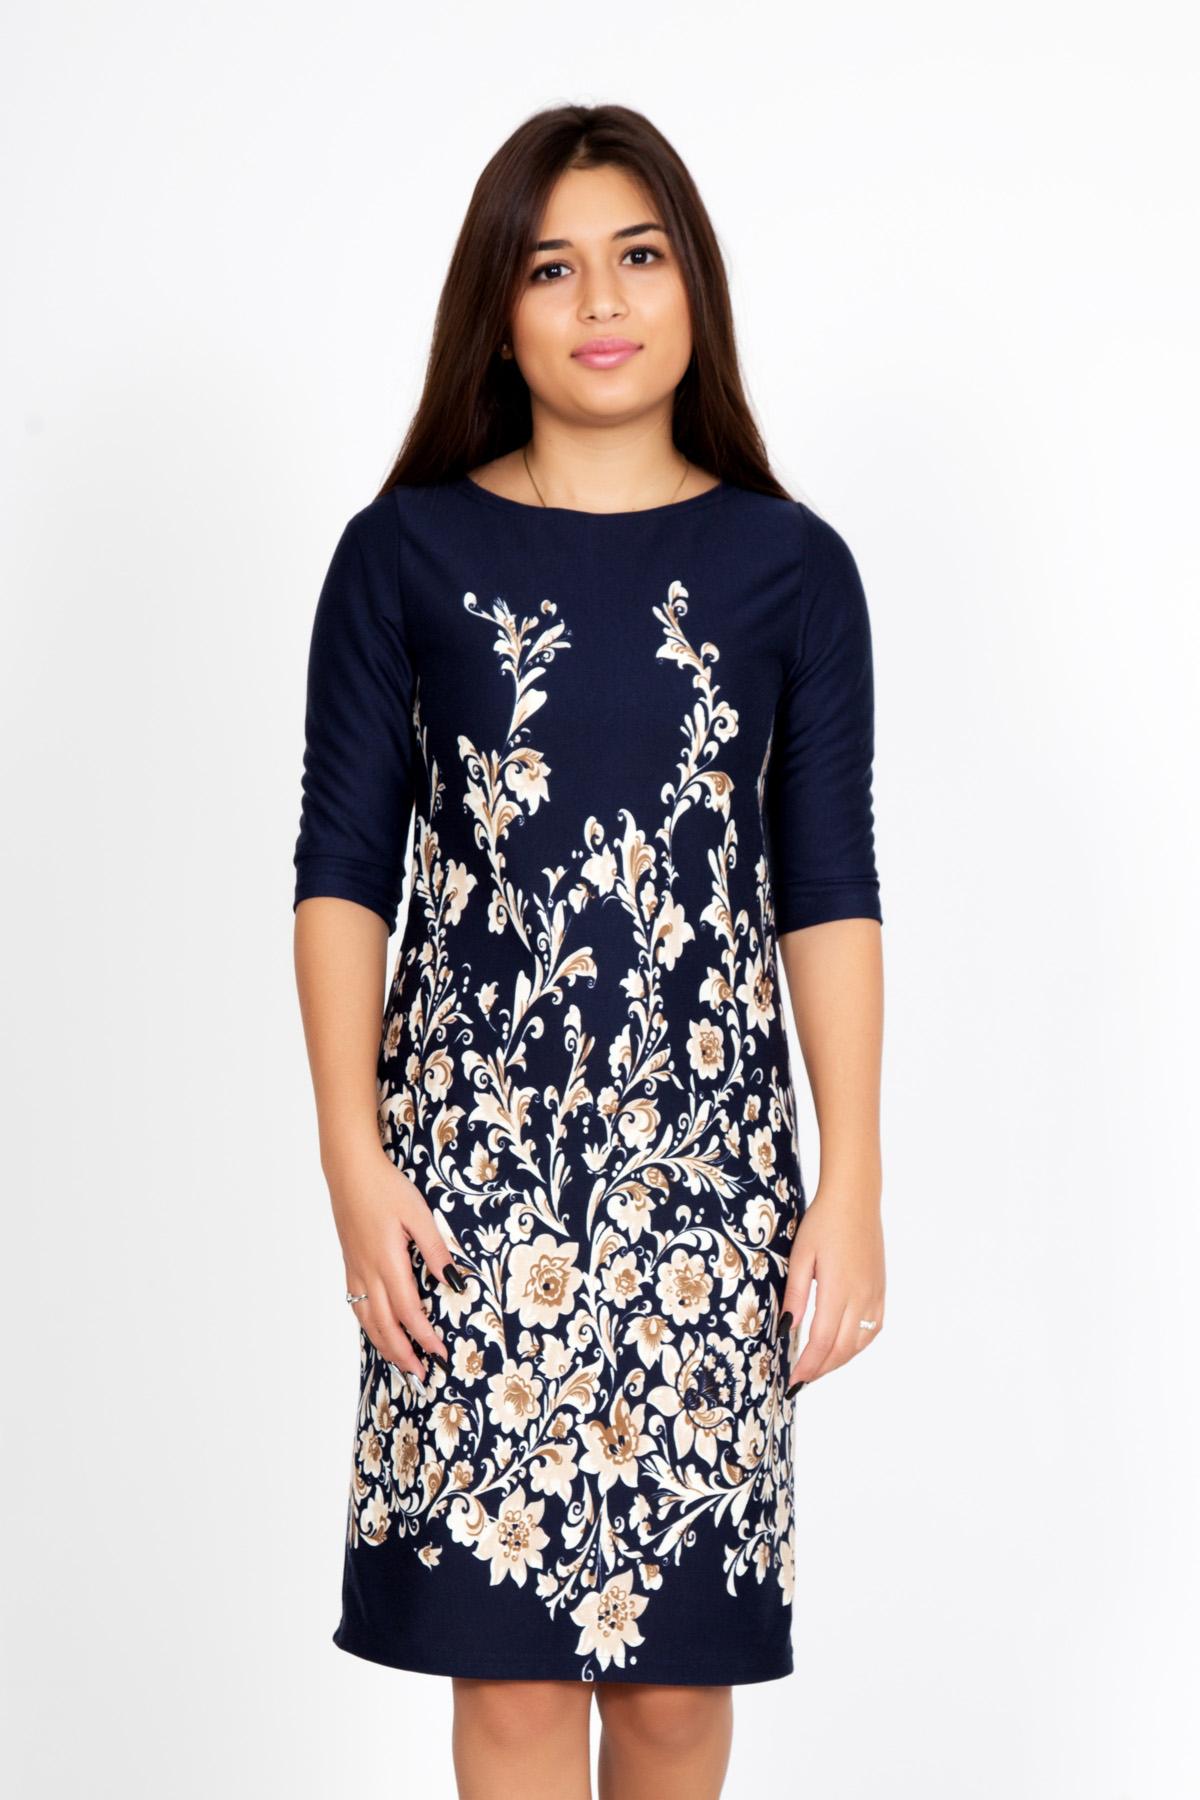 Жен. платье Мариша р. 40Распродажа<br>Обхват груди:80 см<br>Обхват талии:62 см<br>Обхват бедер:88 см<br>Длина по спинке:93 см<br>Рост:167 см<br><br>Тип: Жен. платье<br>Размер: 40<br>Материал: Жаккард